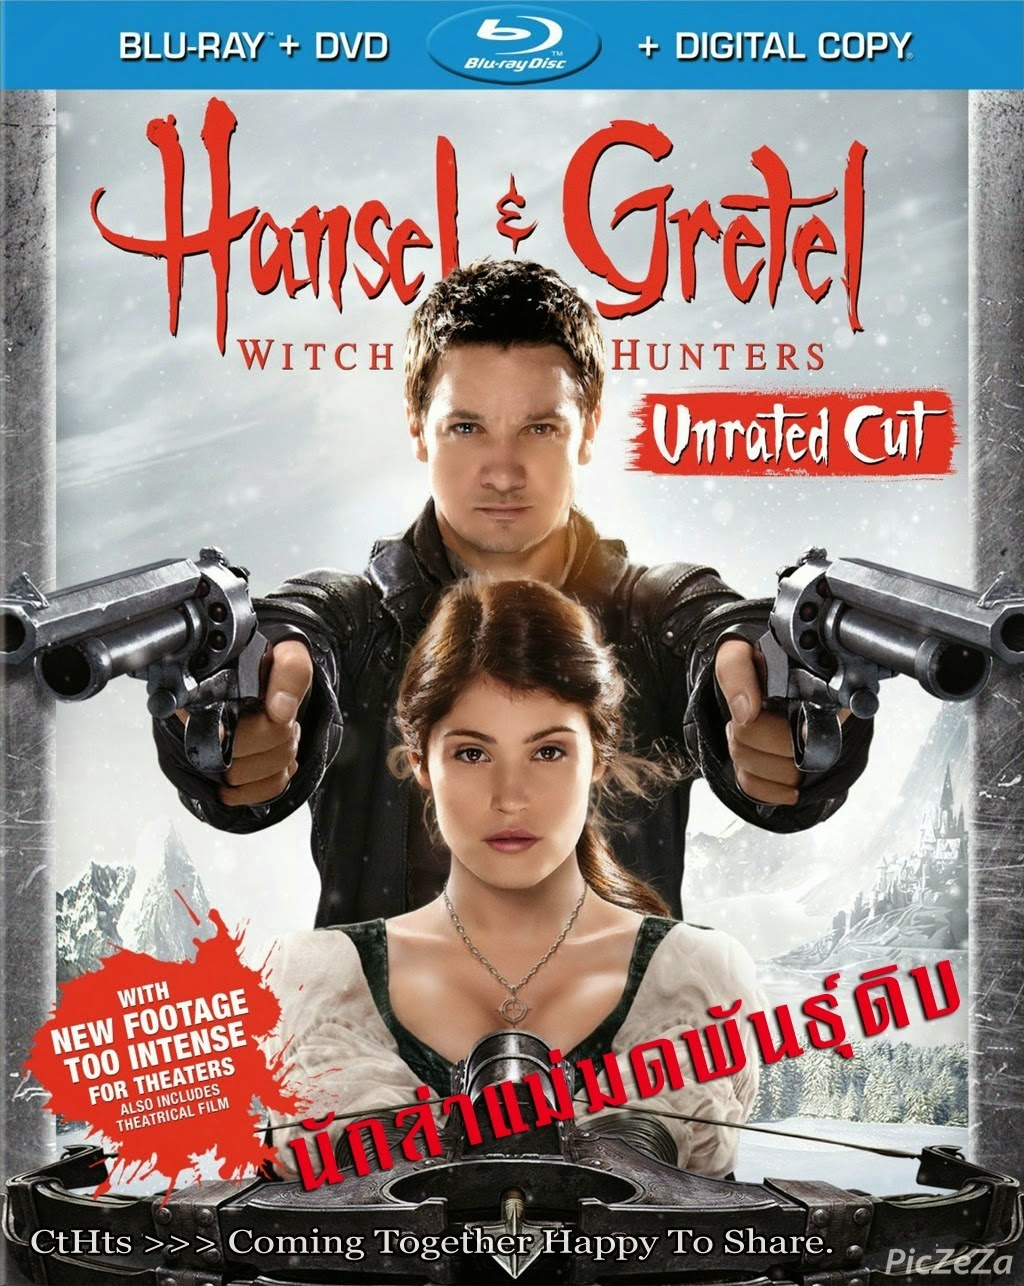 Hansel & Gretel Witch Hunters 2013 นักล่าแม่มดพันธุ์ดิบ